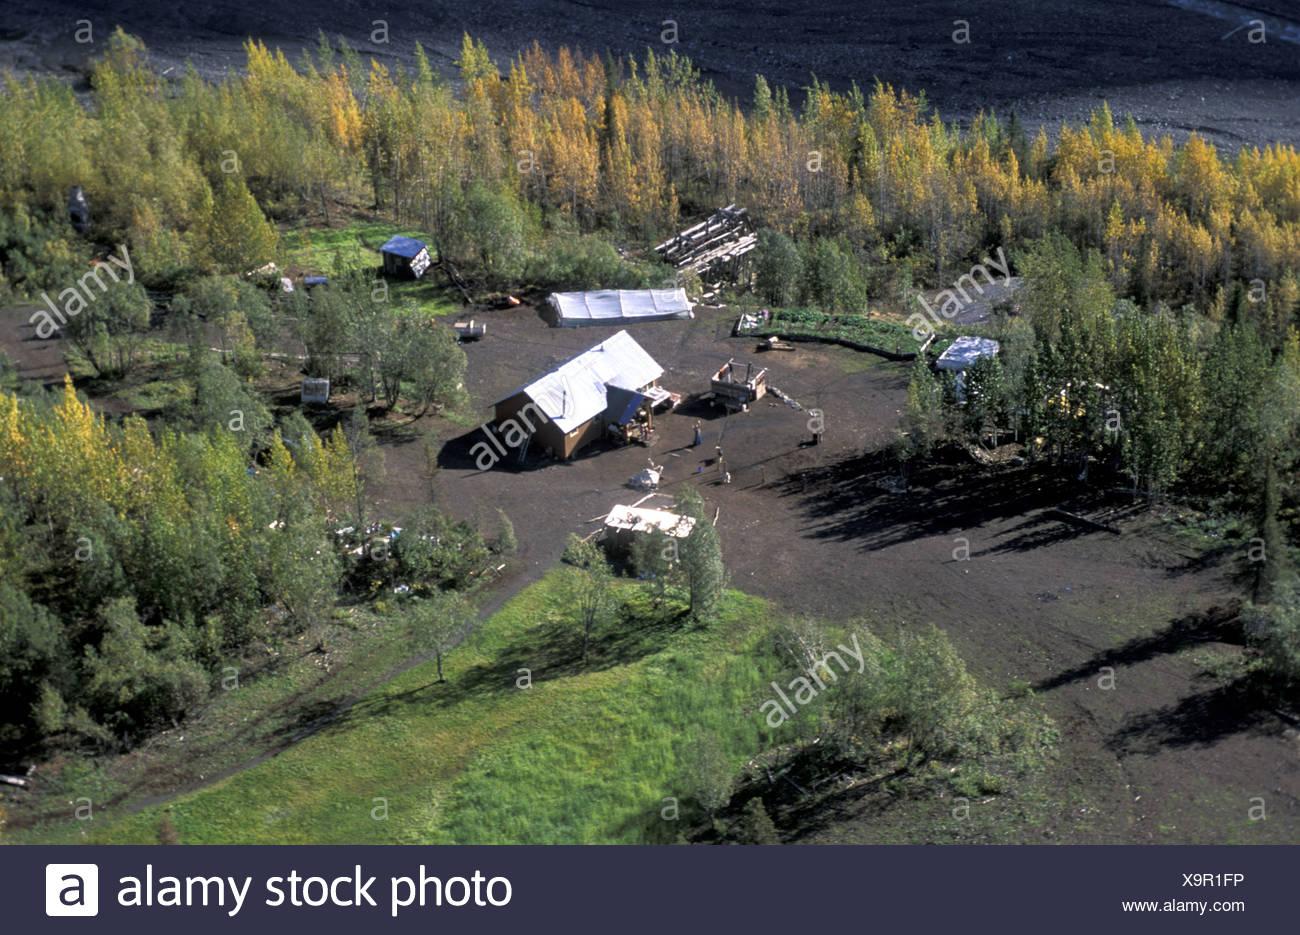 Alaska Homestead Pilgrim family USA America United States forest farm house autumn familiy overview - Stock Image